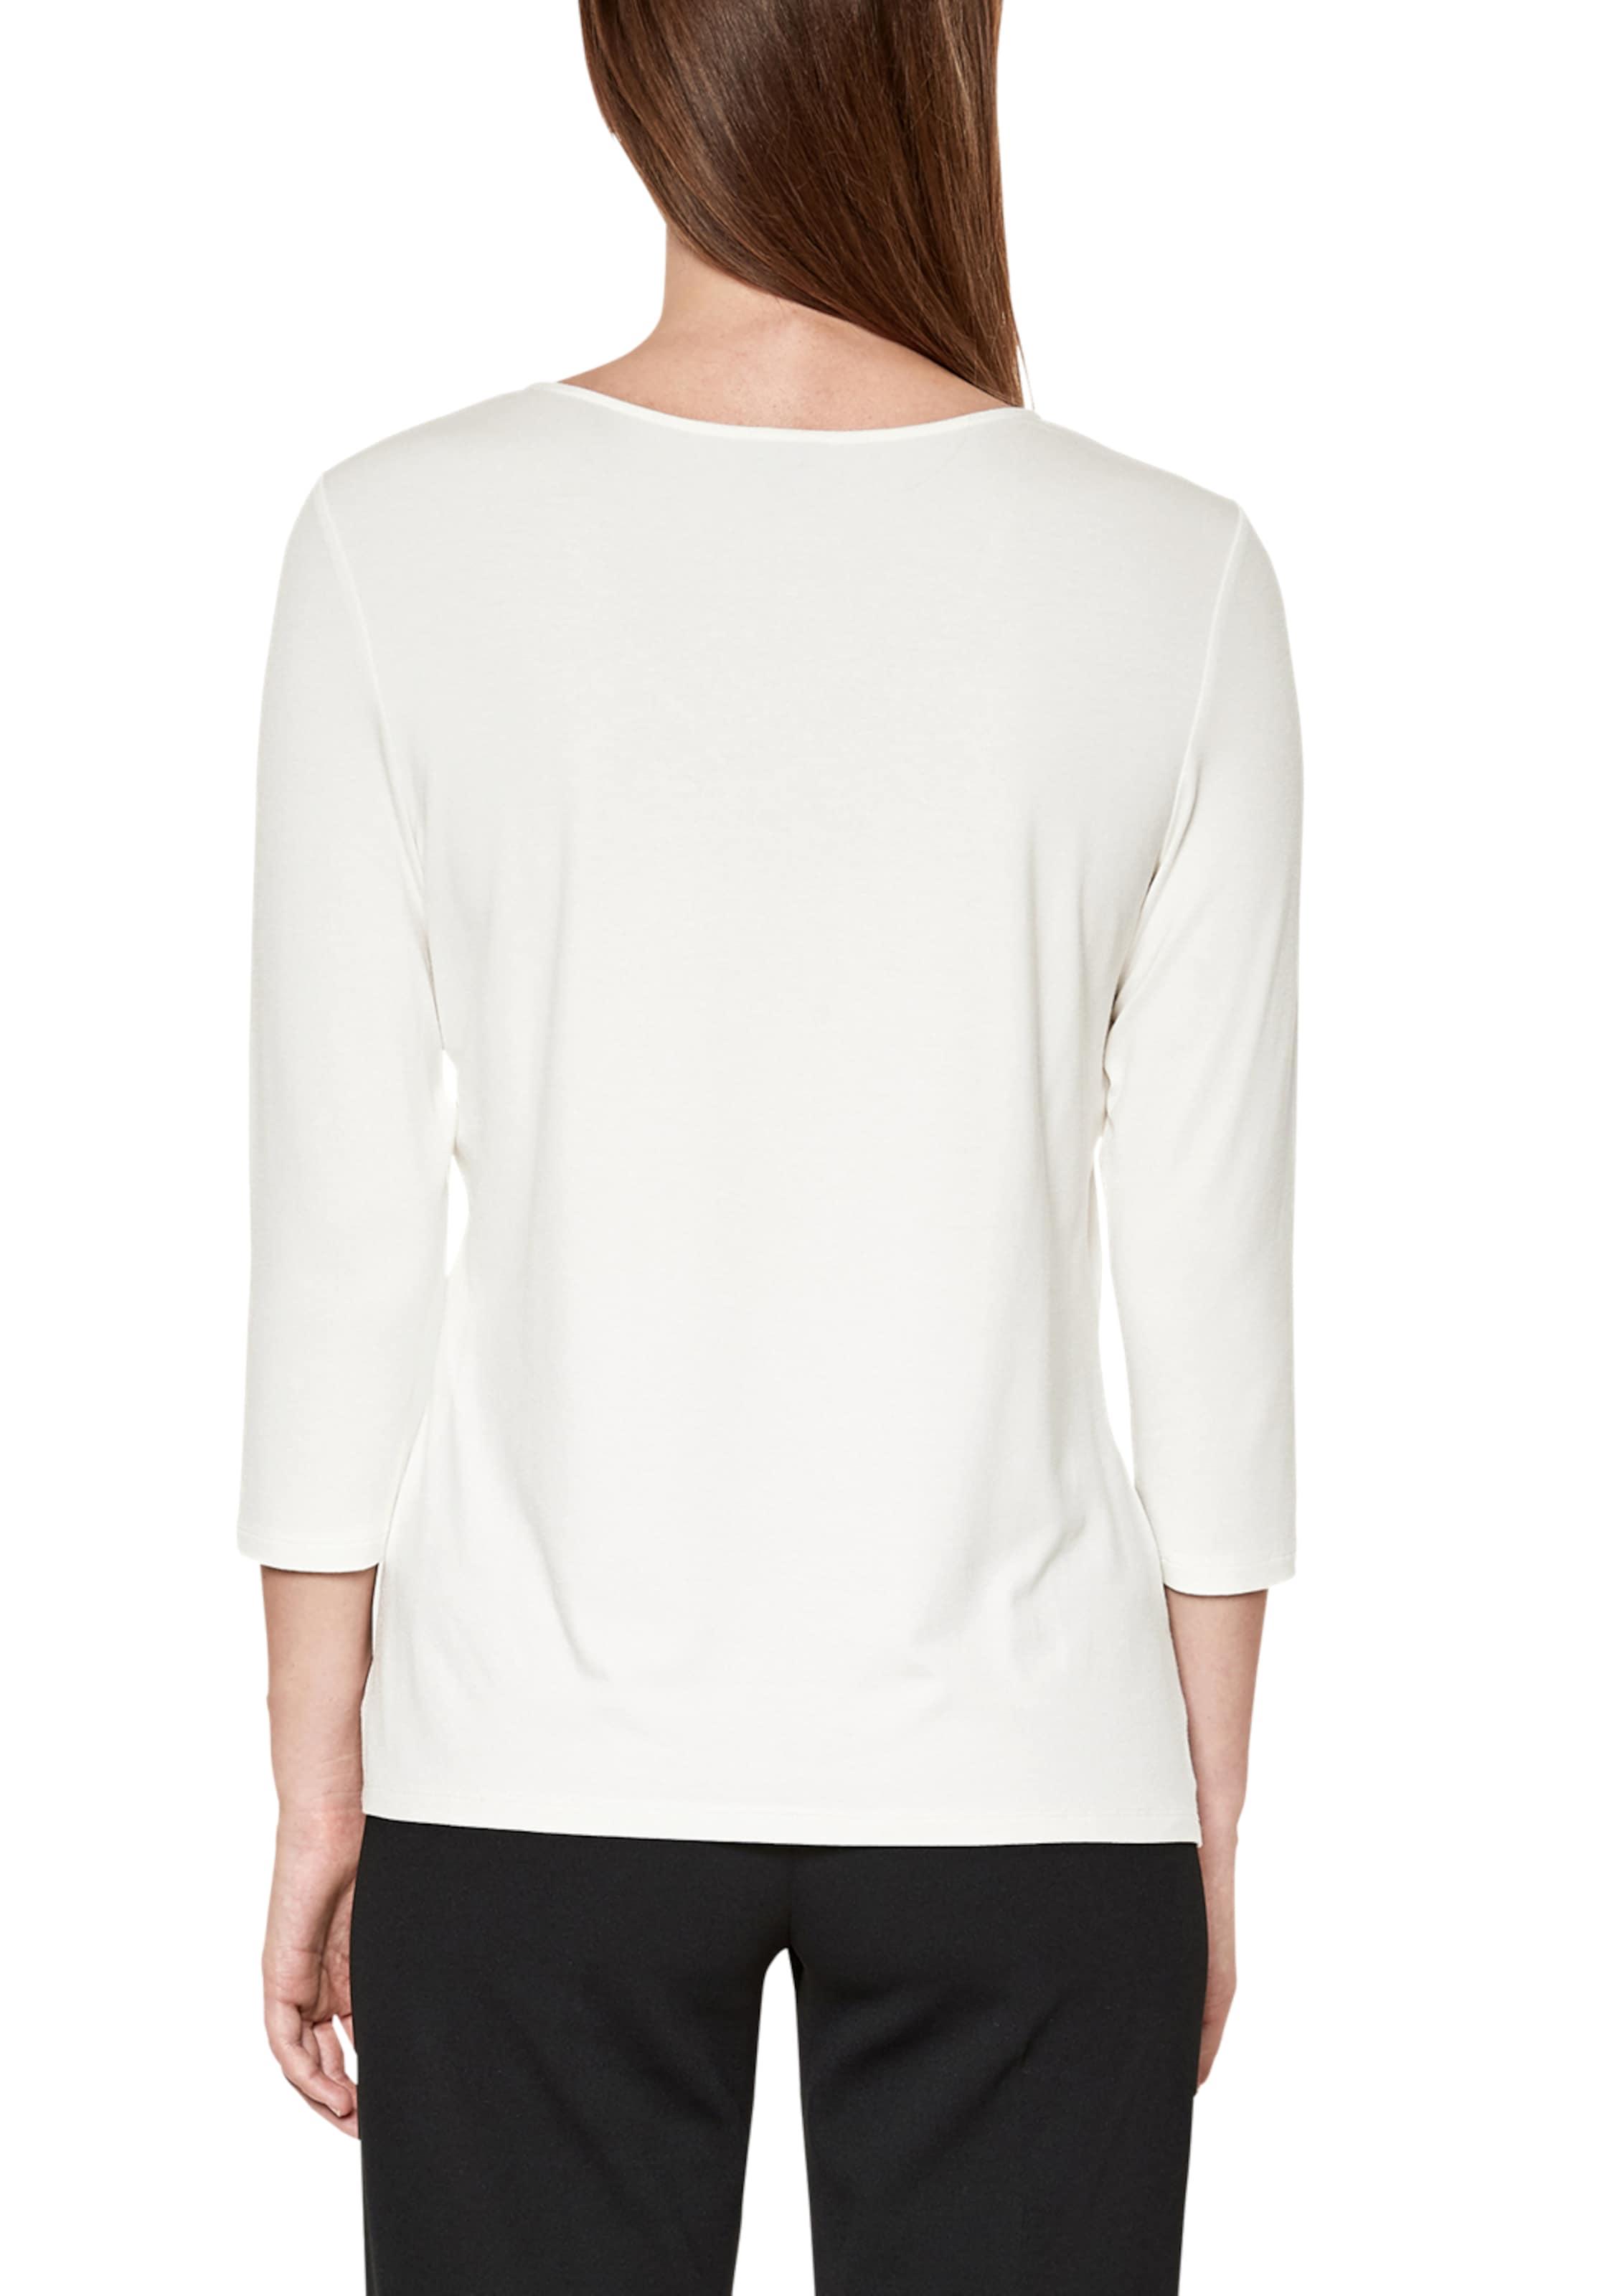 oliver S Label Weiß In Black Blusenshirt g7yv6Ybf